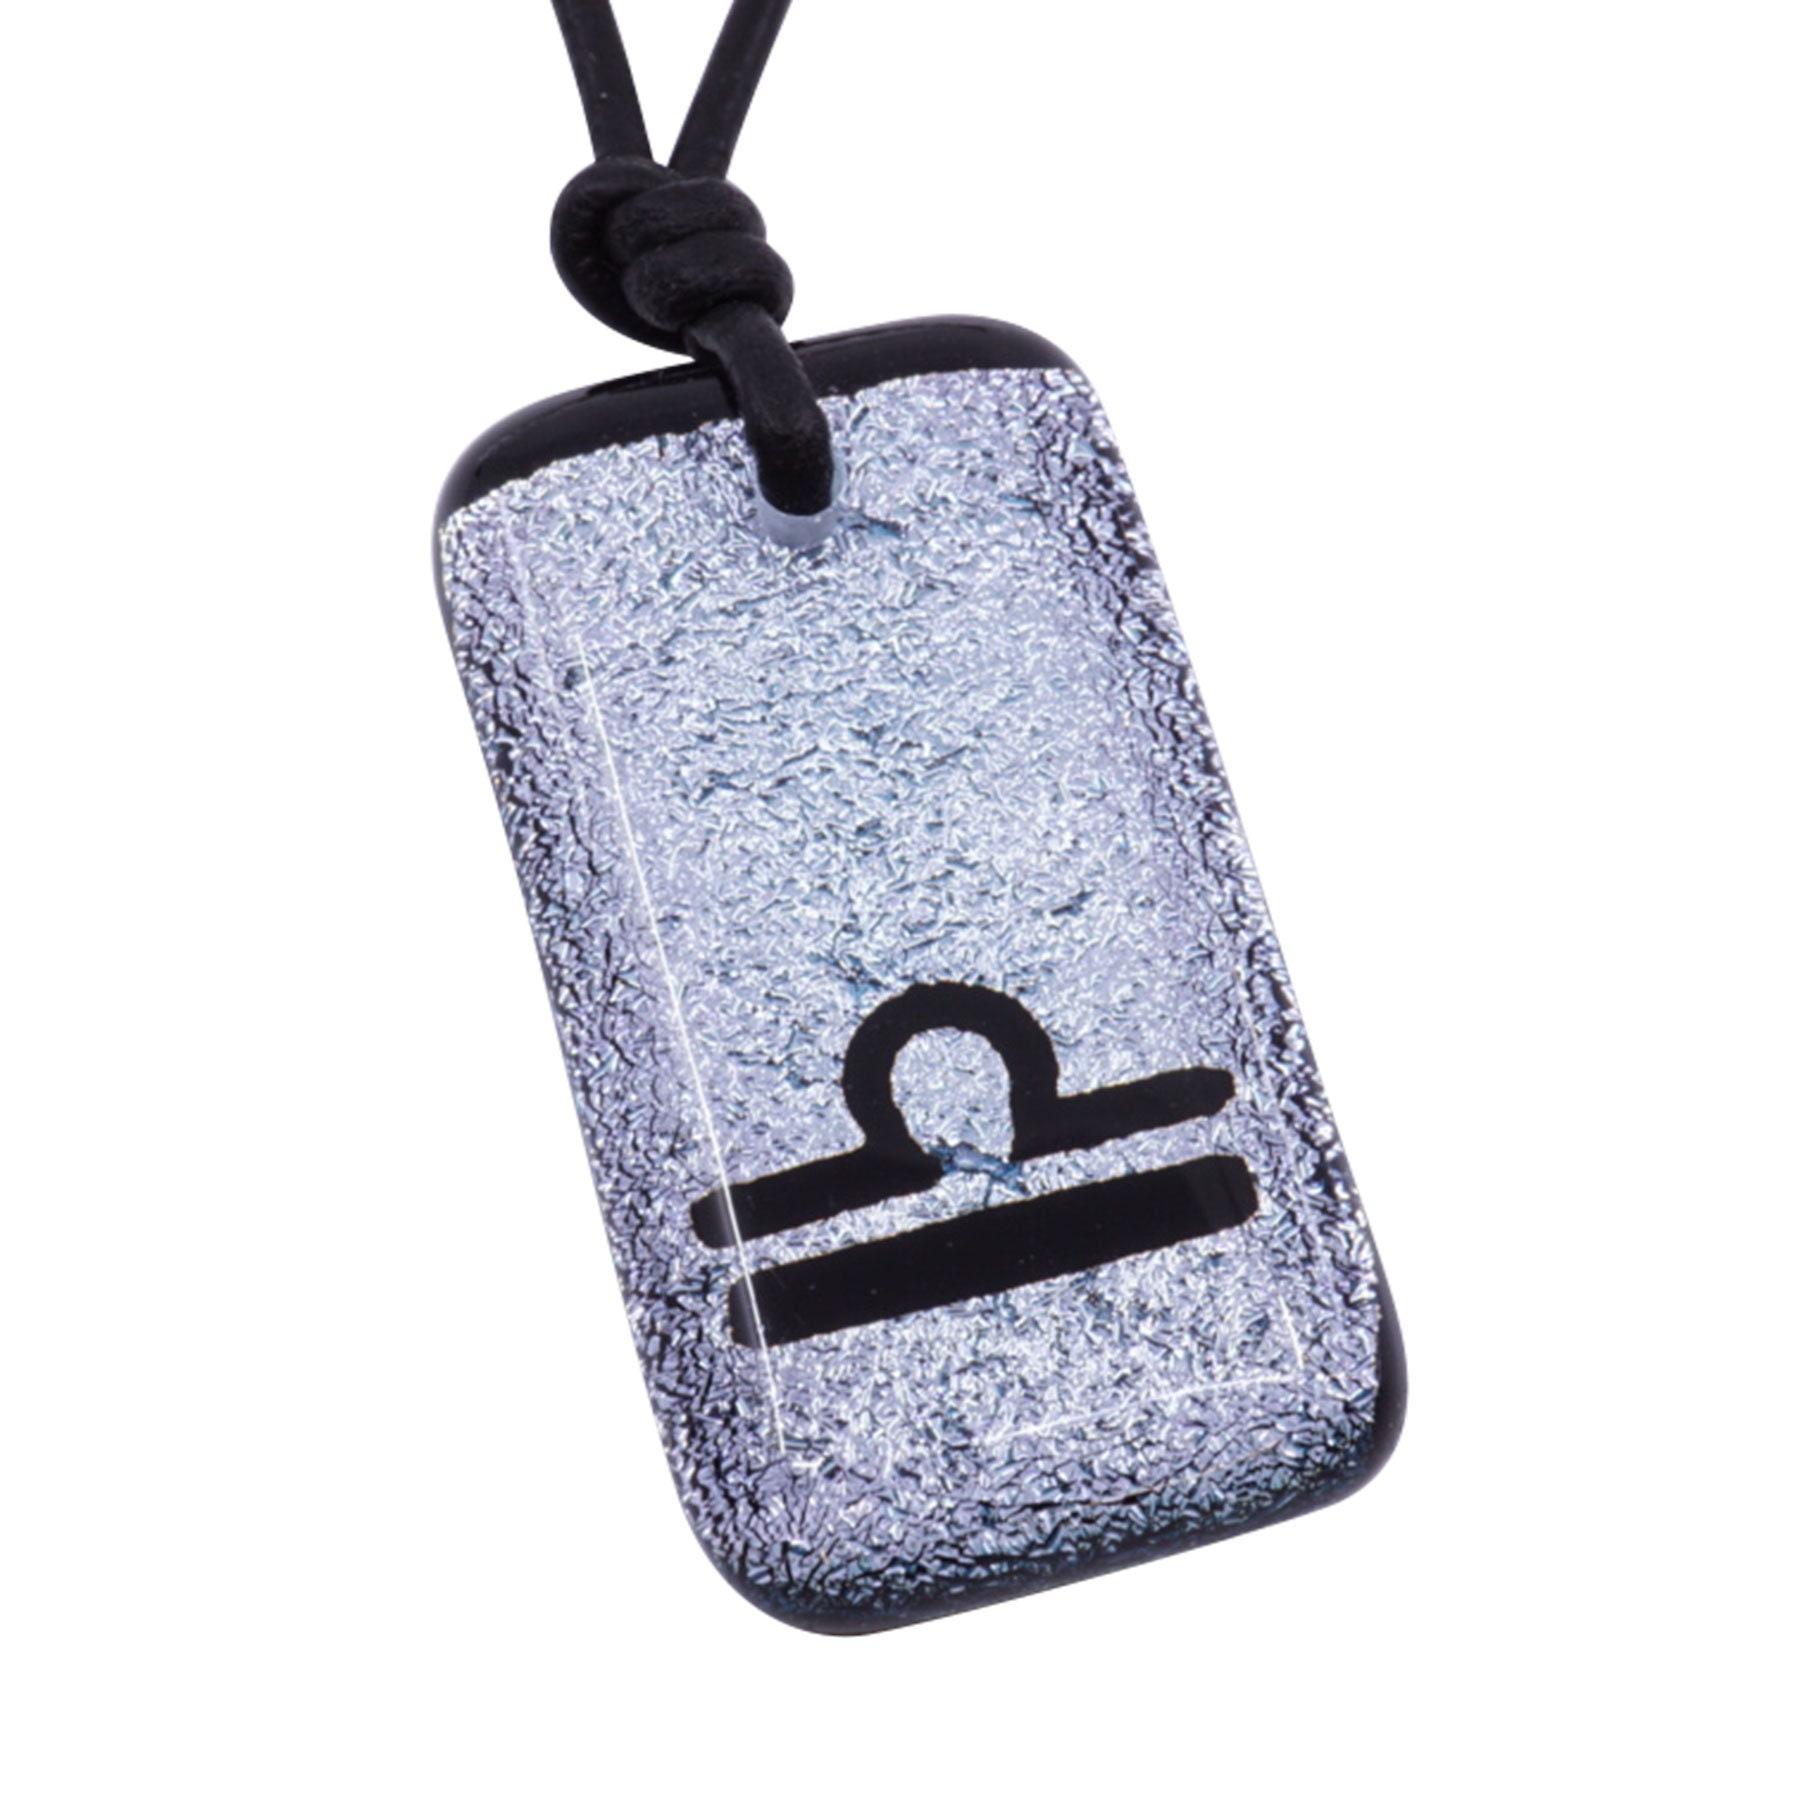 Gemini Zodiac Sign Minimalist Necklace horoscope jewelry silver color dichroic glass Handmade By ZulaSurfing